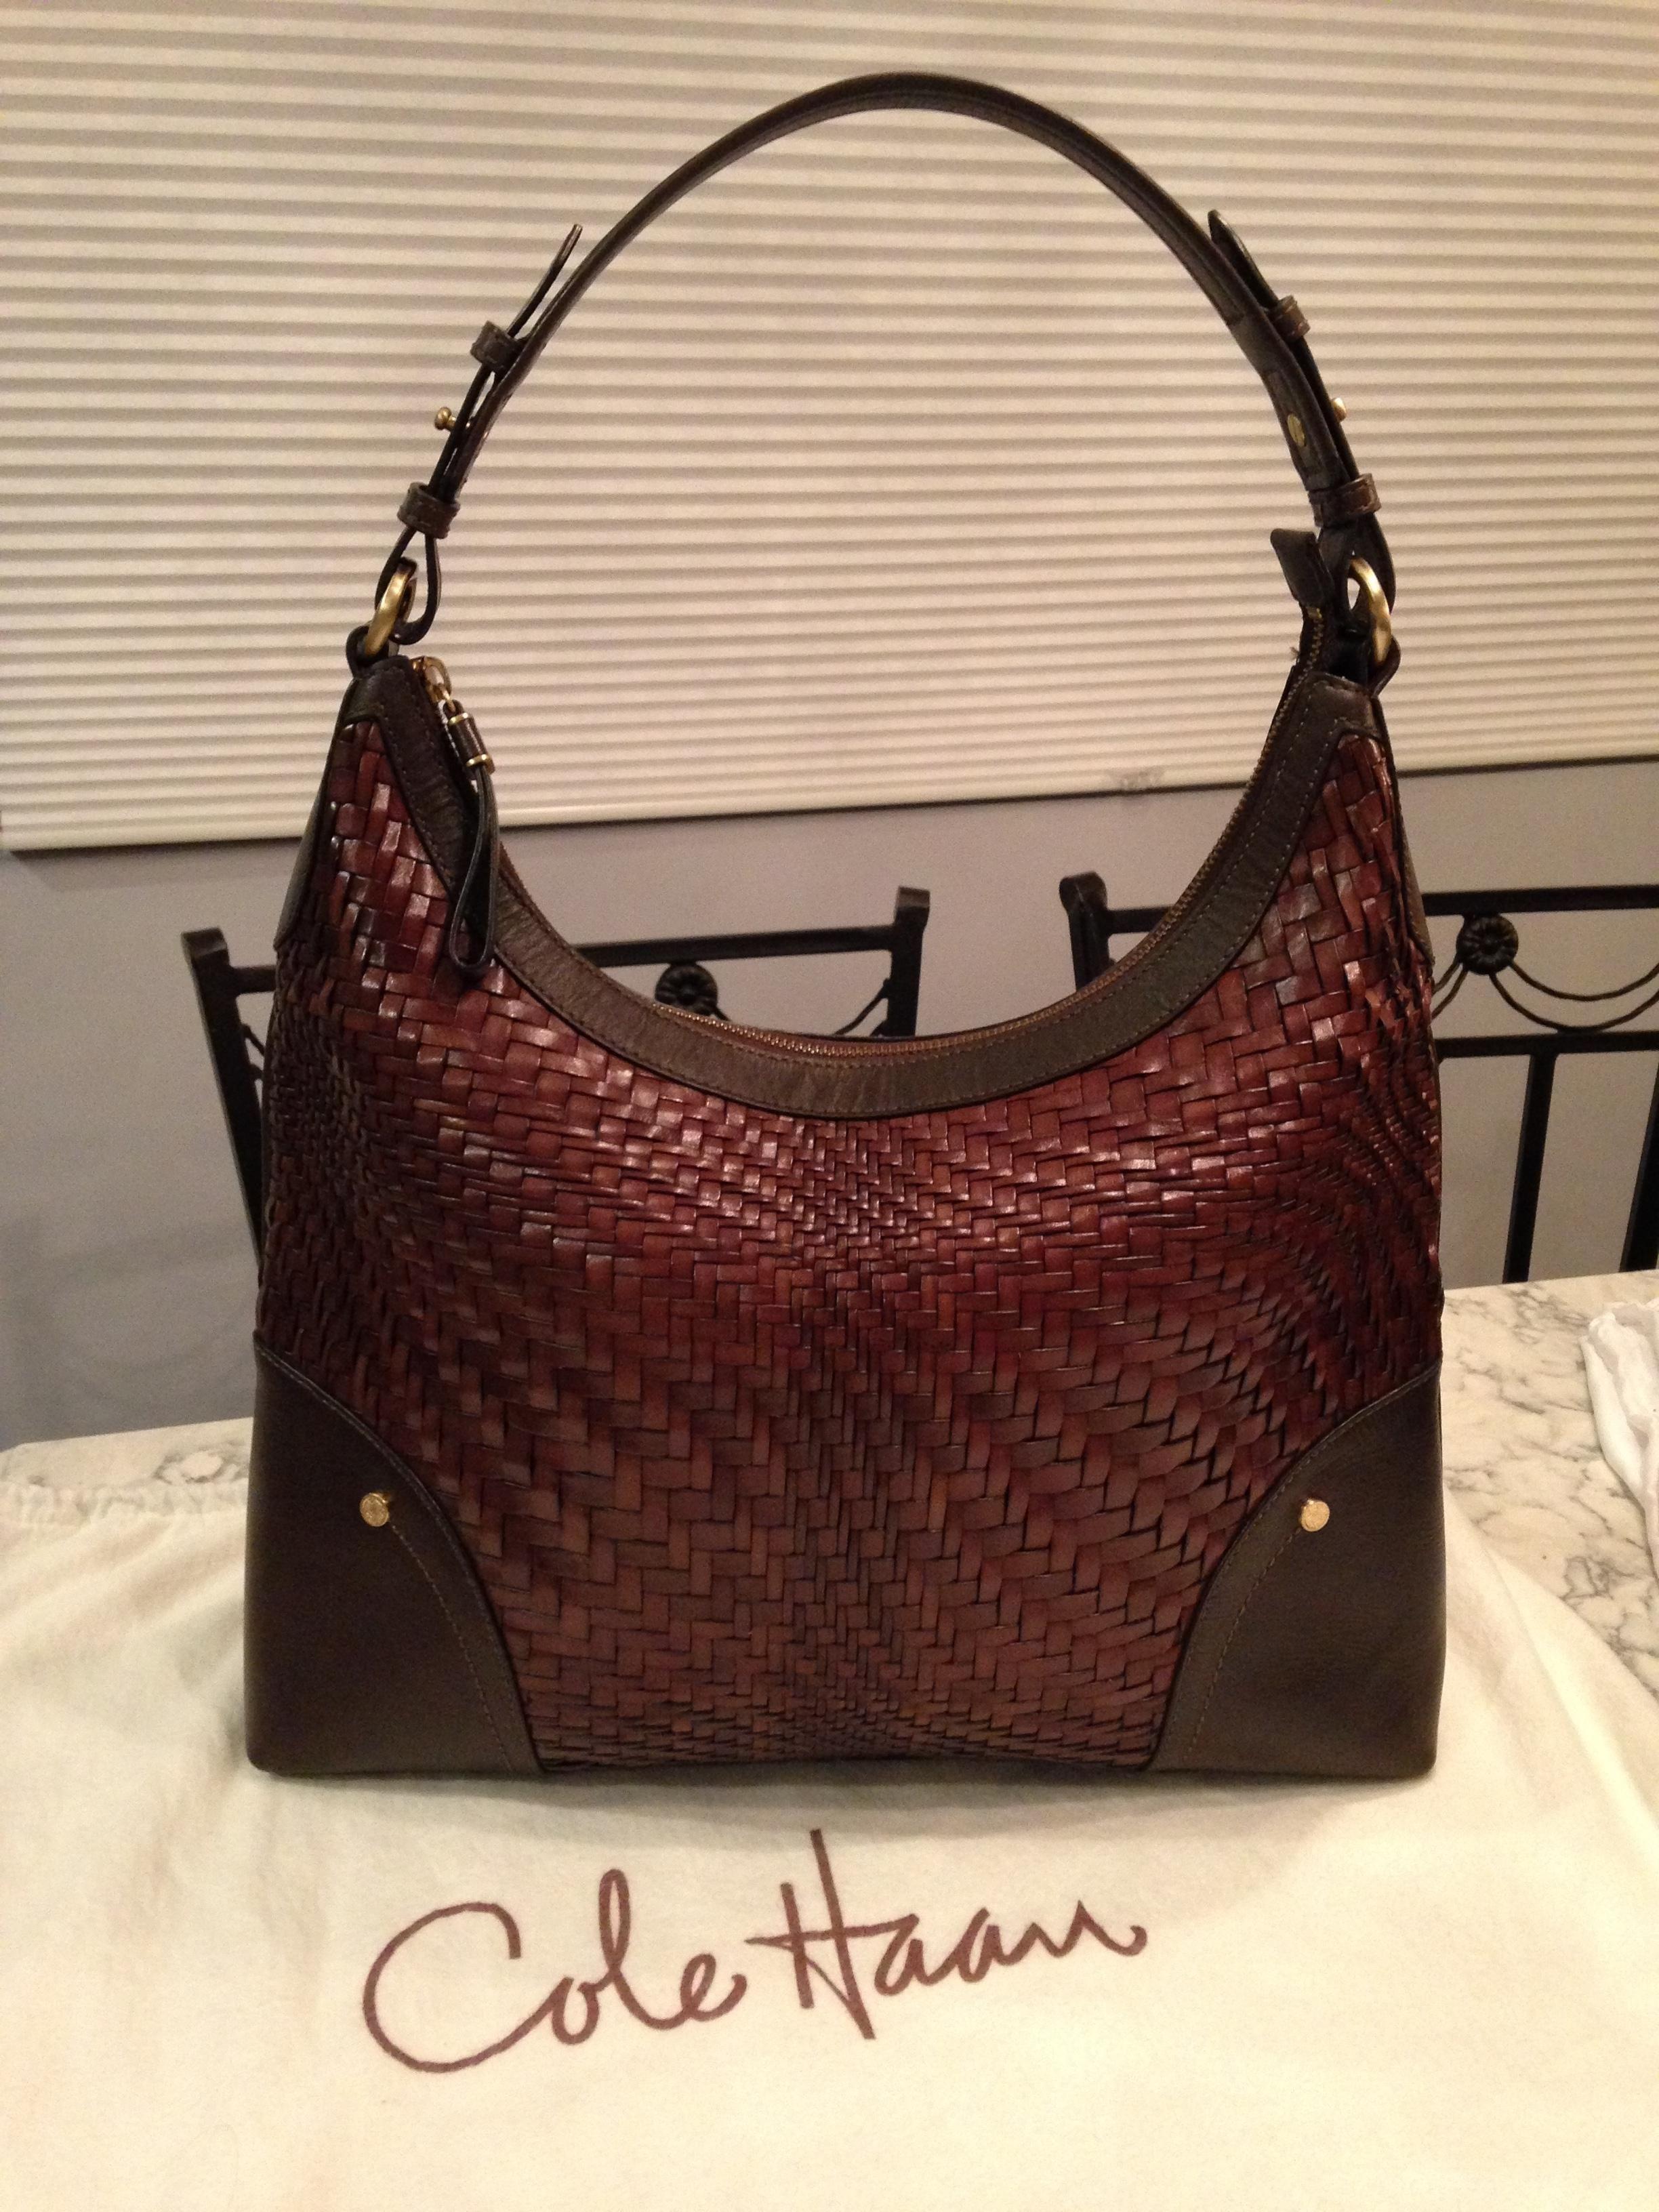 aa4edcf66 Cole Haan Genevieve Woven Brown Leather Tote Satchel Handbag Hobo Bag. Hobo  bags are hot this season! The Cole Haan Genevieve Woven Brown Leather Tote  ...